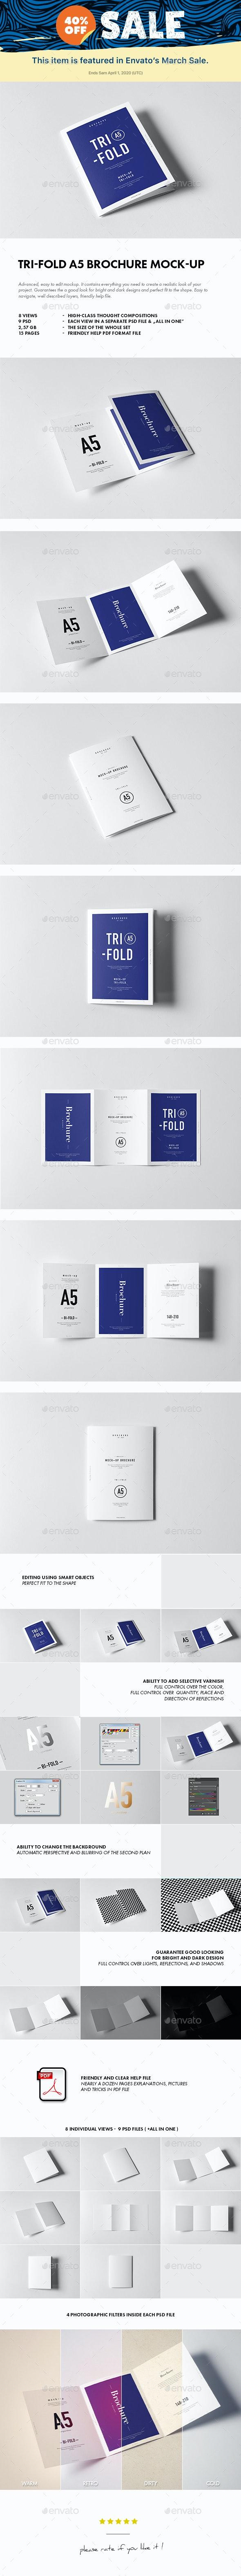 Tri-Fold A5 Brochure Mock-up - Brochures Print